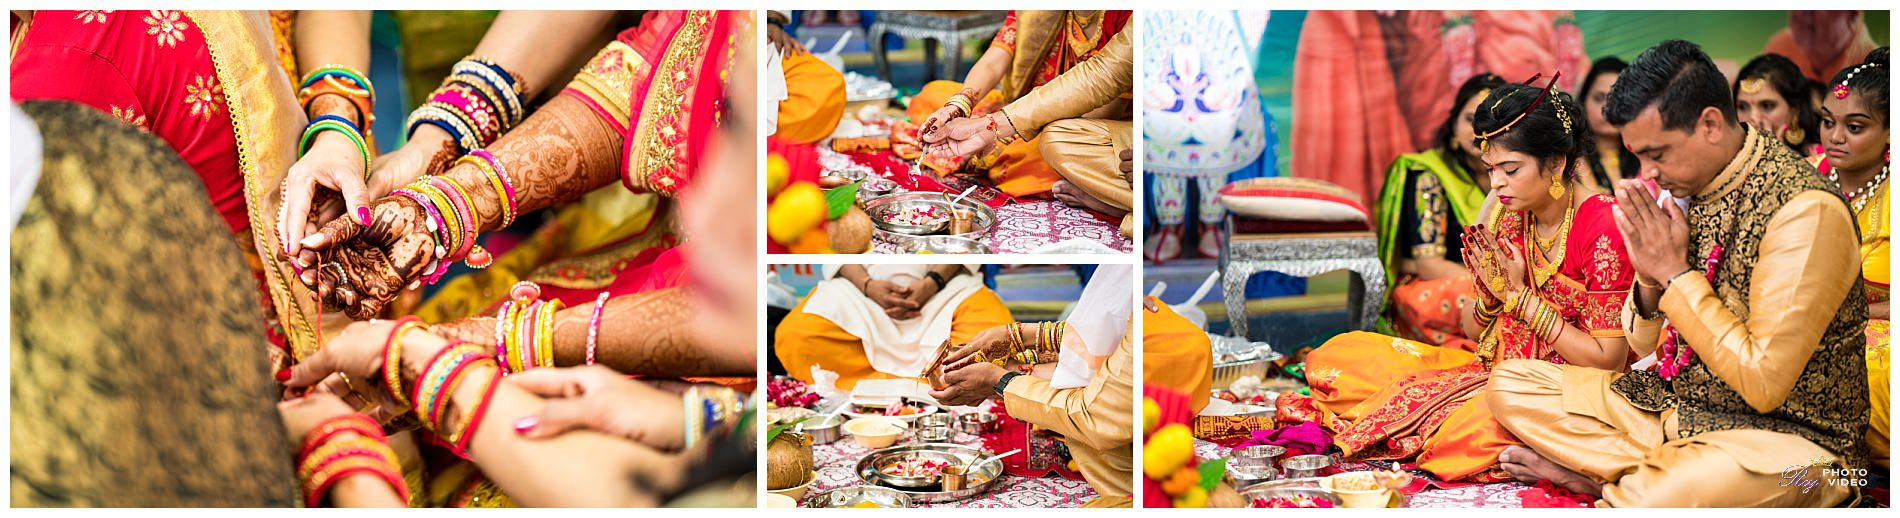 doubletree-by-hilton-hotel-wilmington-de-wedding-krishna-ritesh-12.jpg